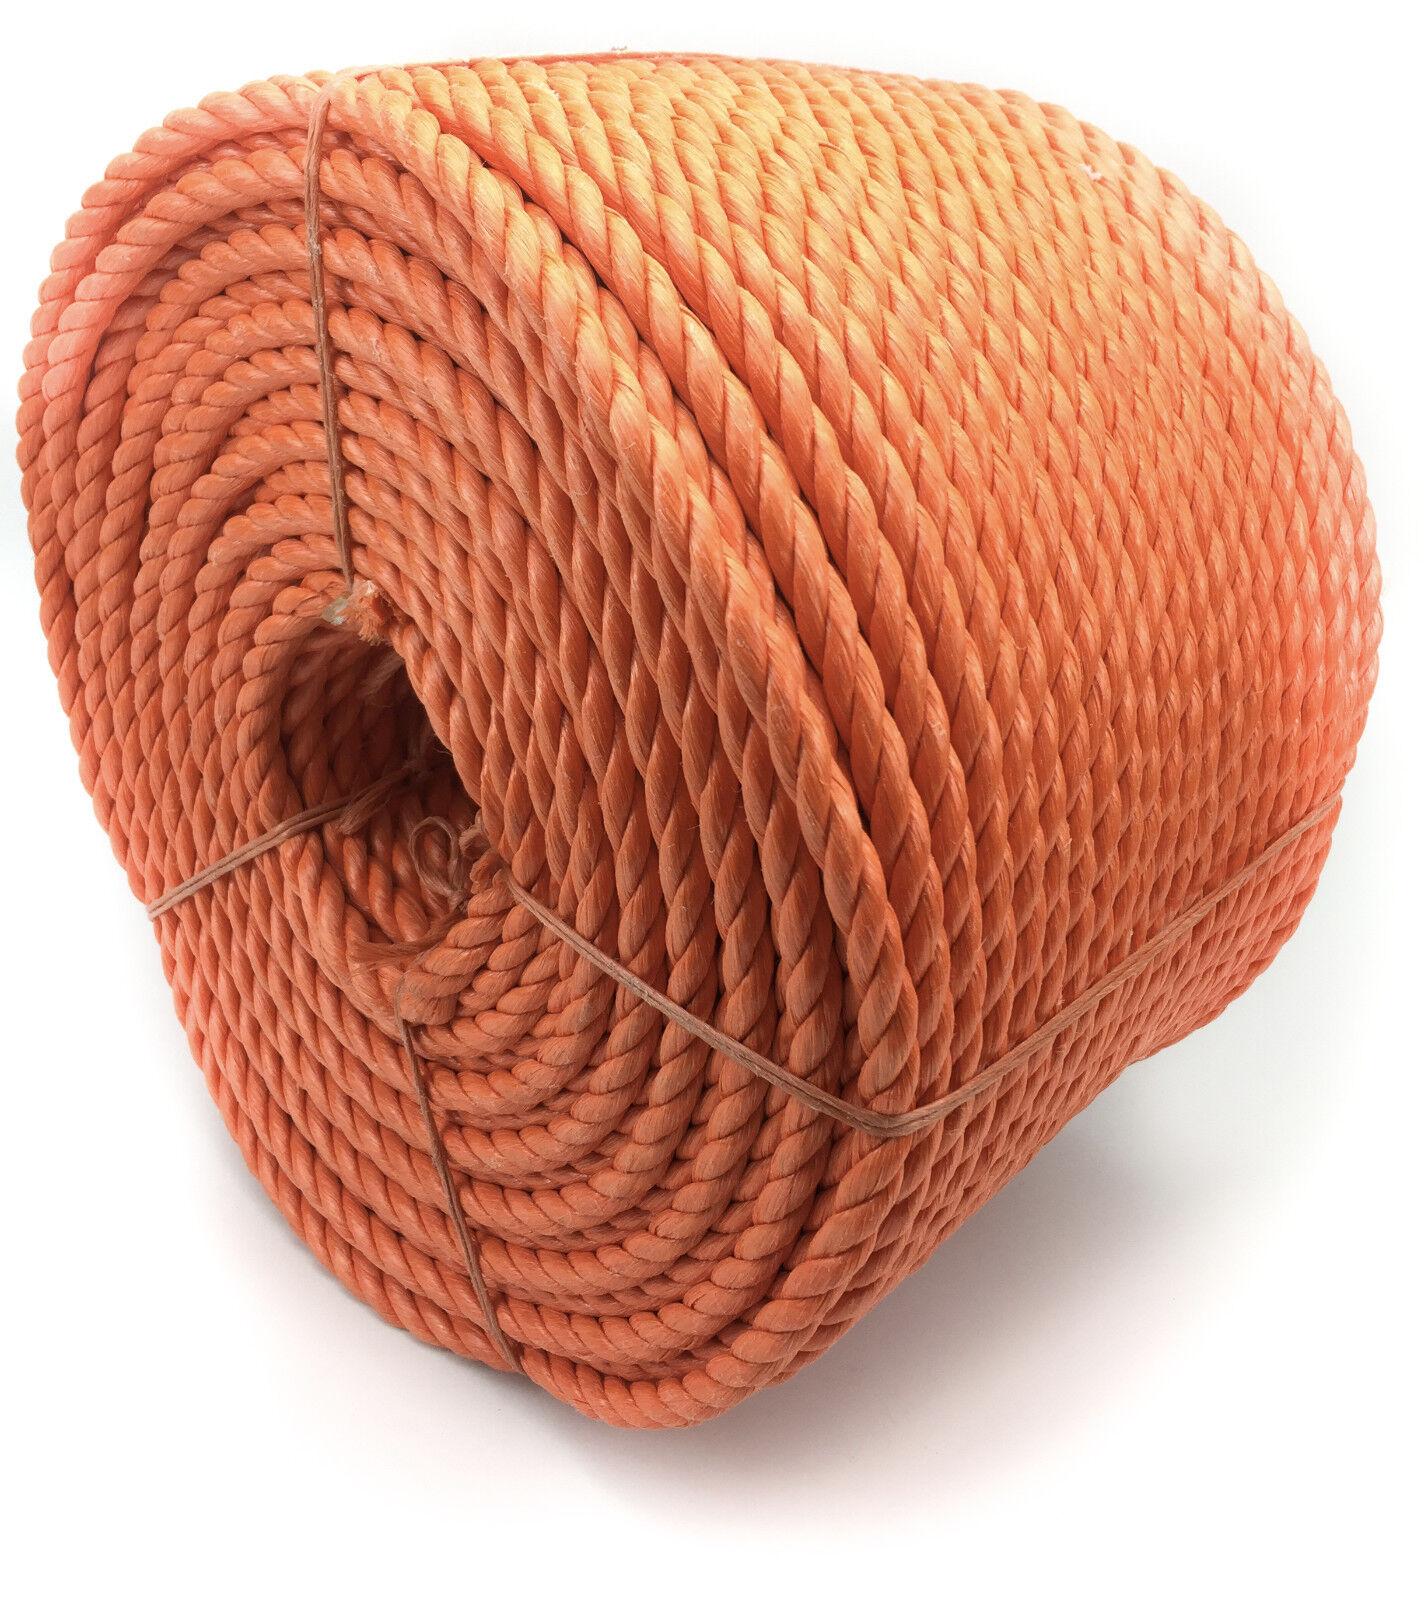 20mm orange Polypropylene Rope x 45 Metres, Poly Rope Coils, Cheap Nylon Rope